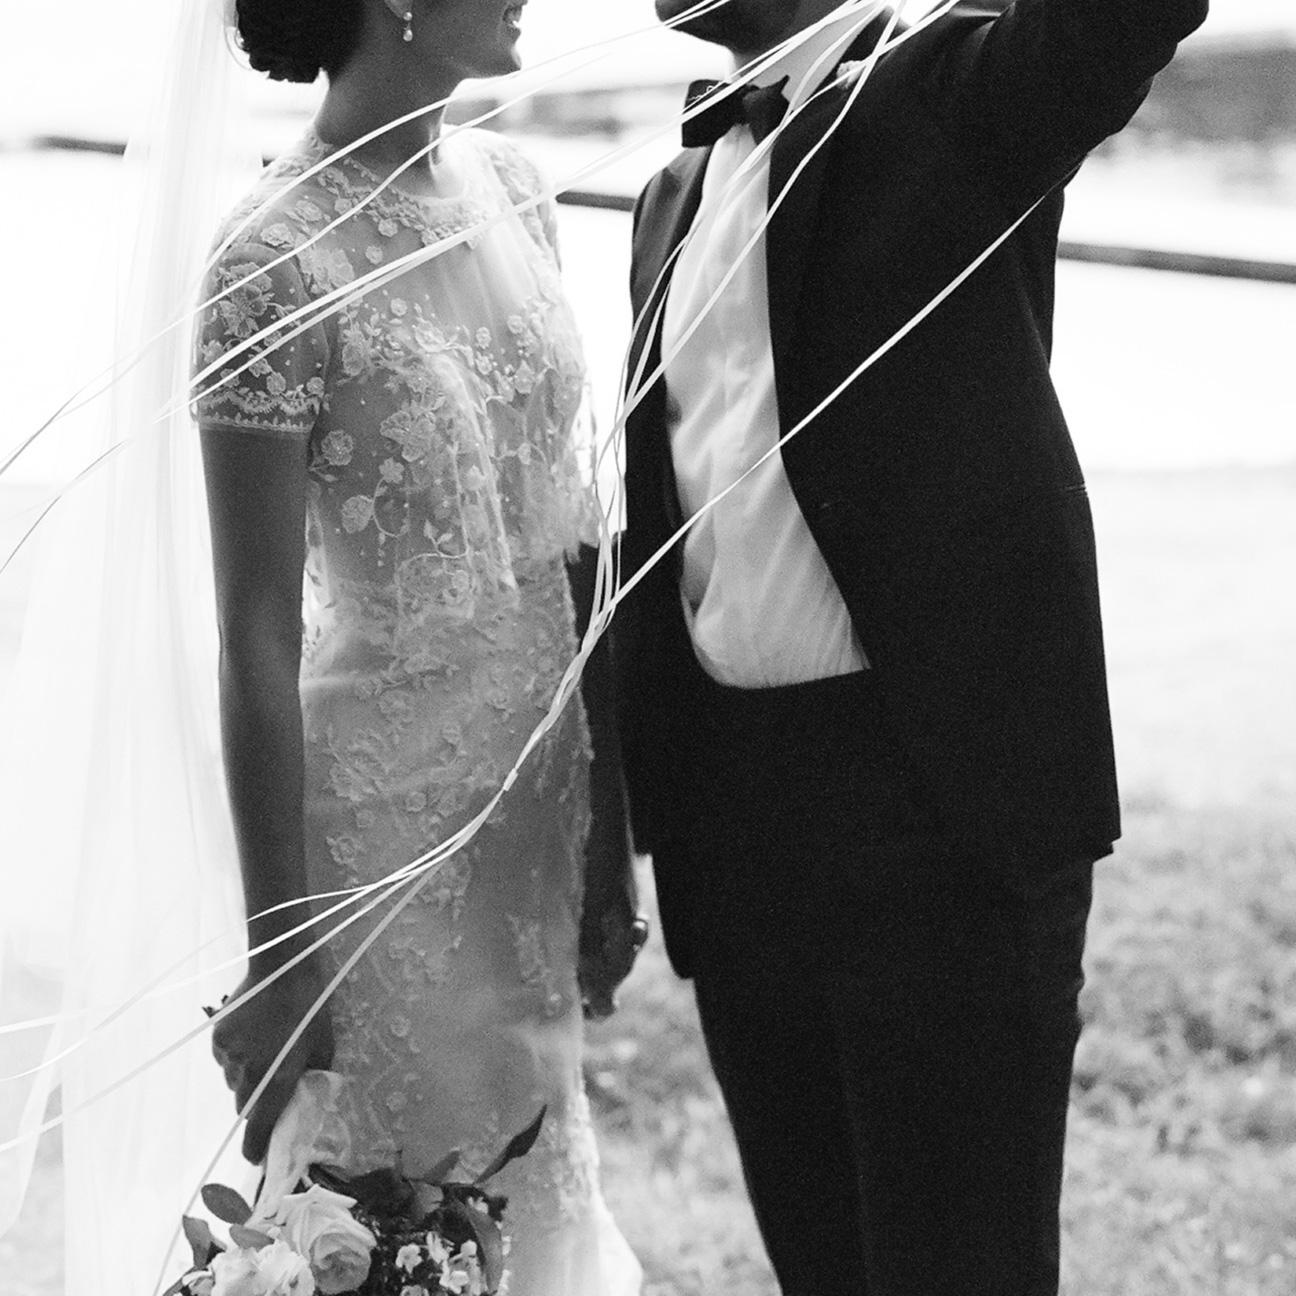 KarenHillPhotography-Parizat-Wedding-0255.jpg